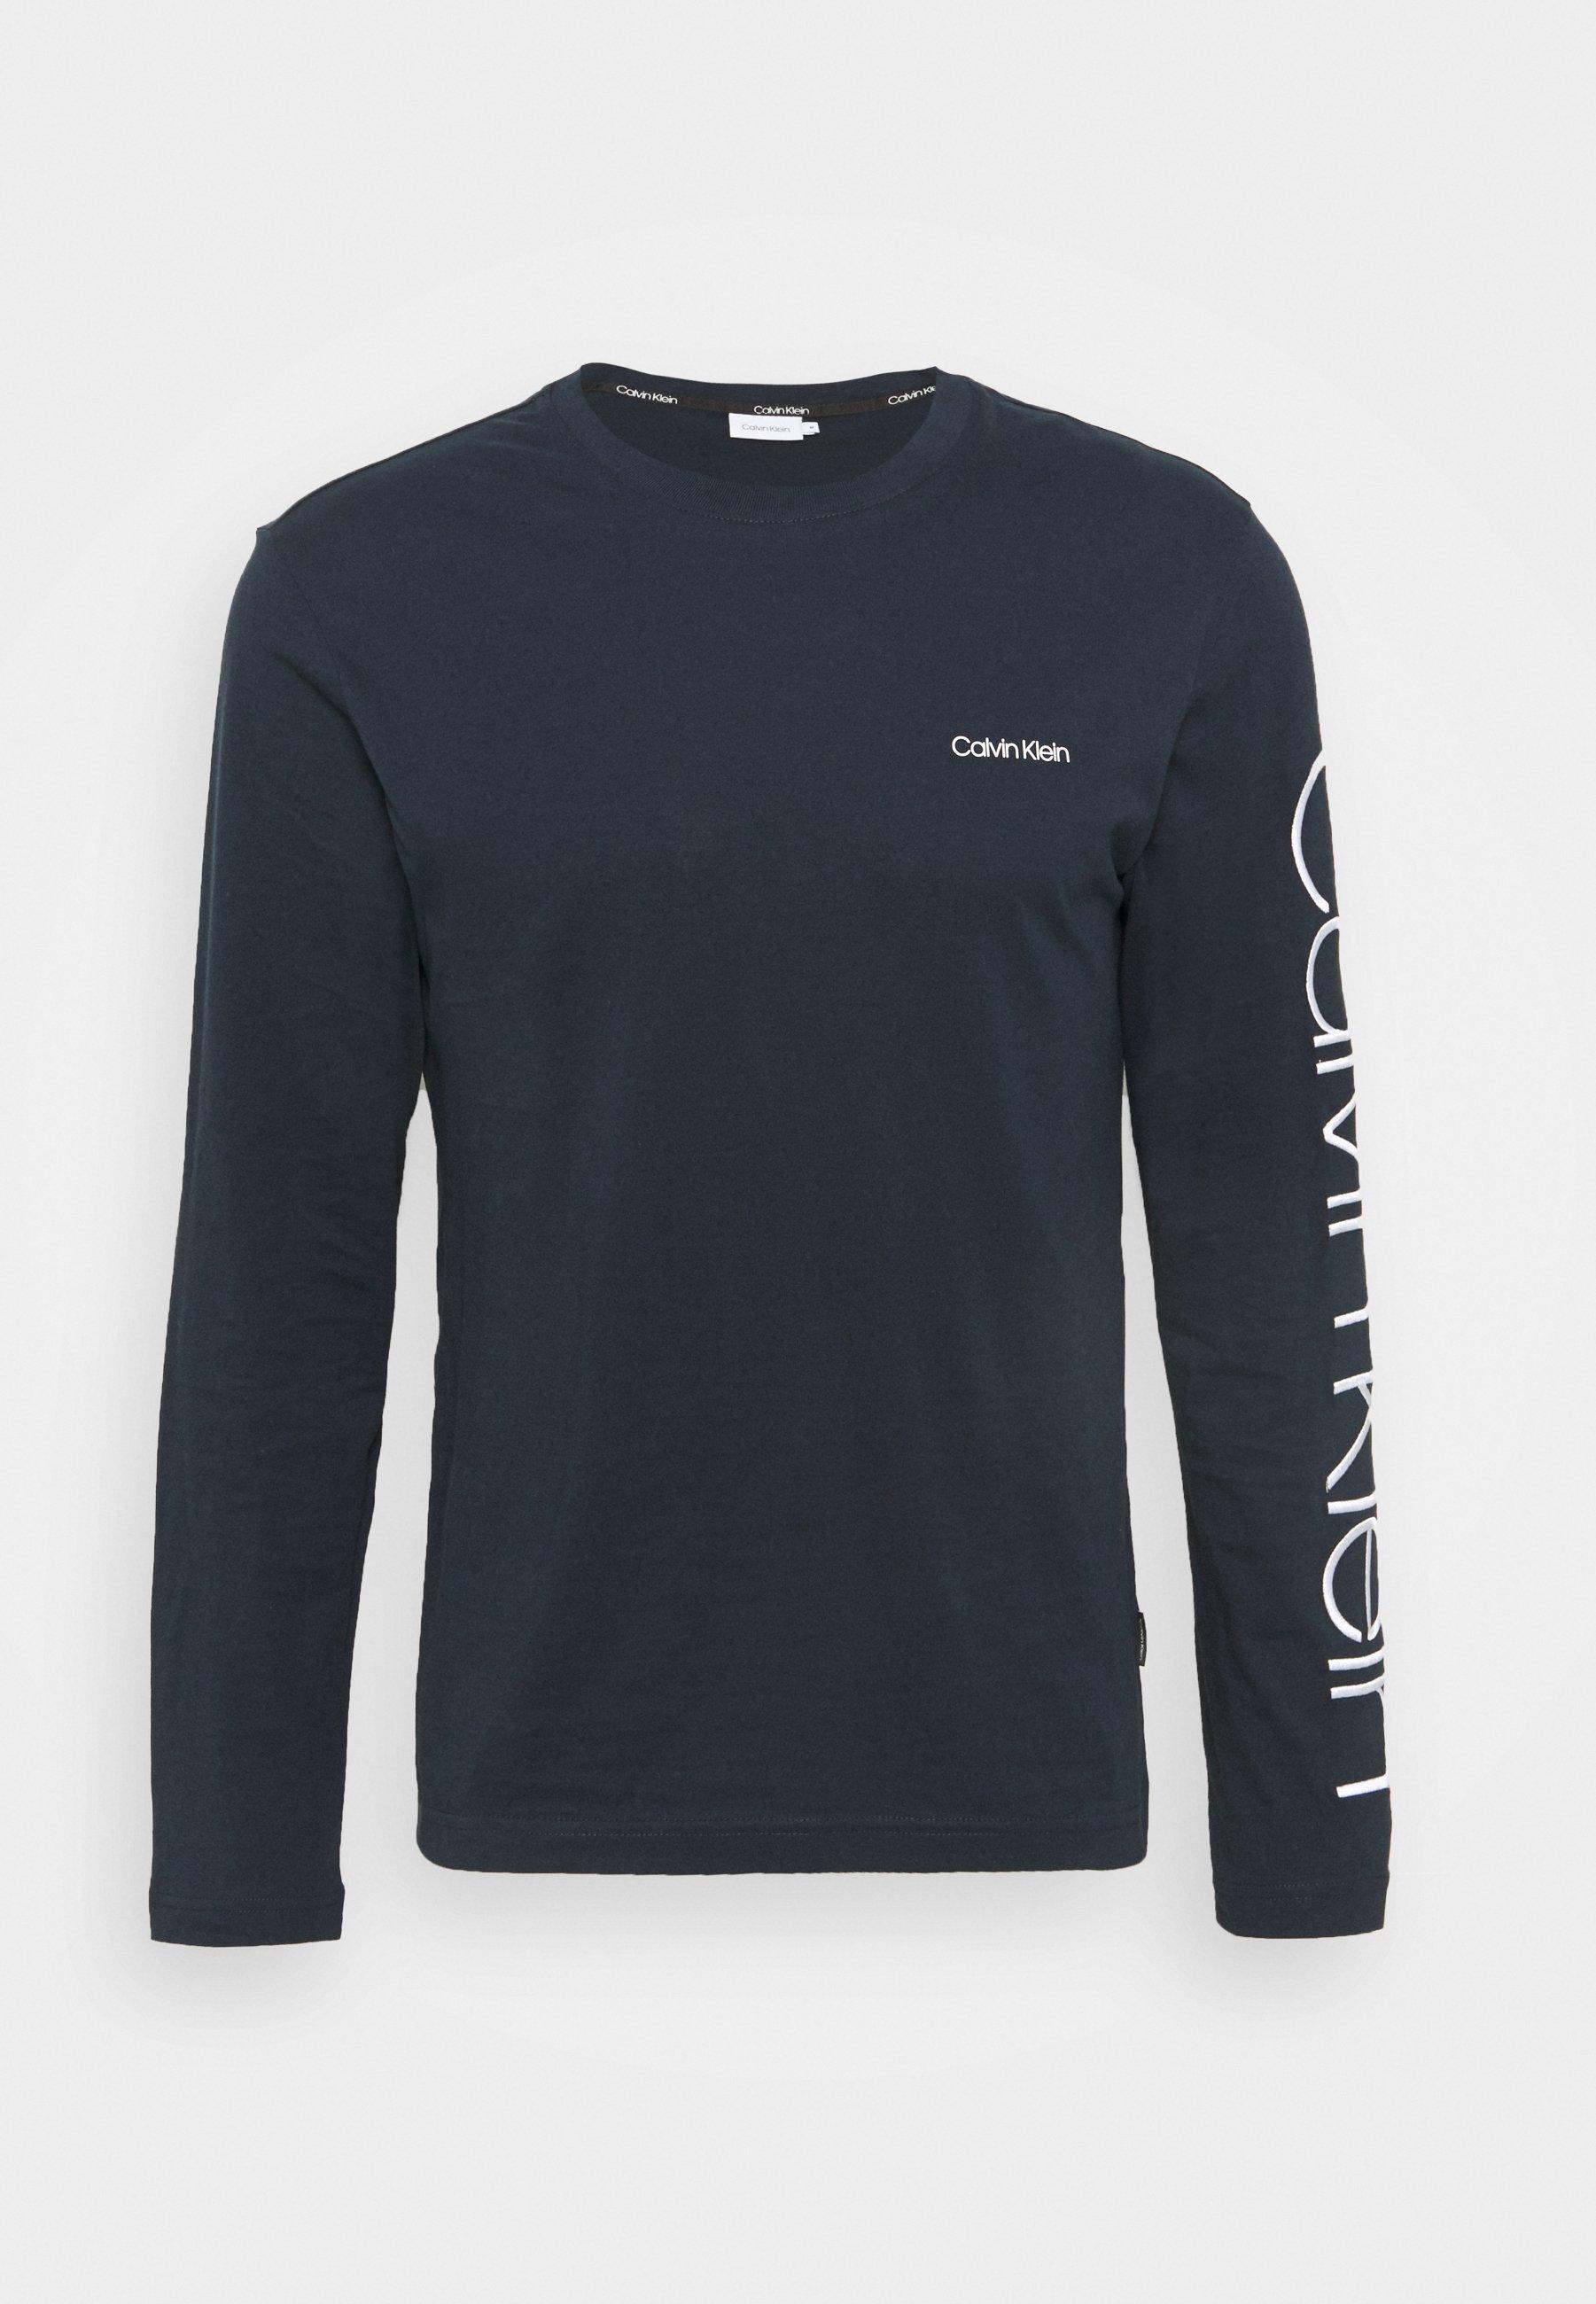 Uomo LOGO LONG SLEEVE - Maglietta a manica lunga